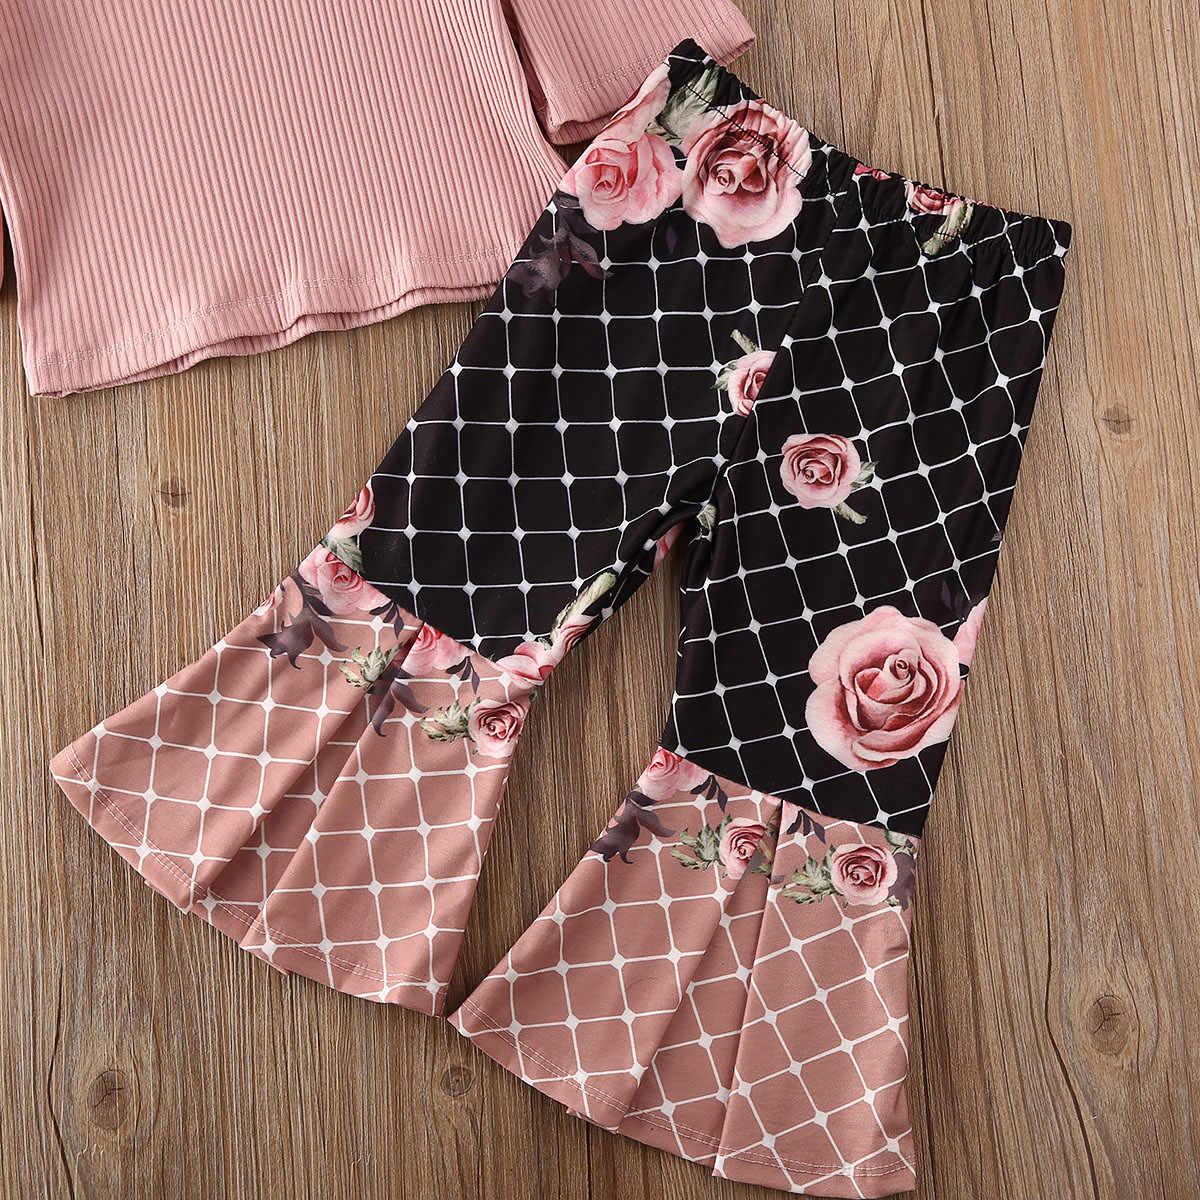 Peuter Baby Meisje Kleding Sets Solid Trui Ruche Lange Mouwen Top Bloemenprint Flare Broek Broek Outfits